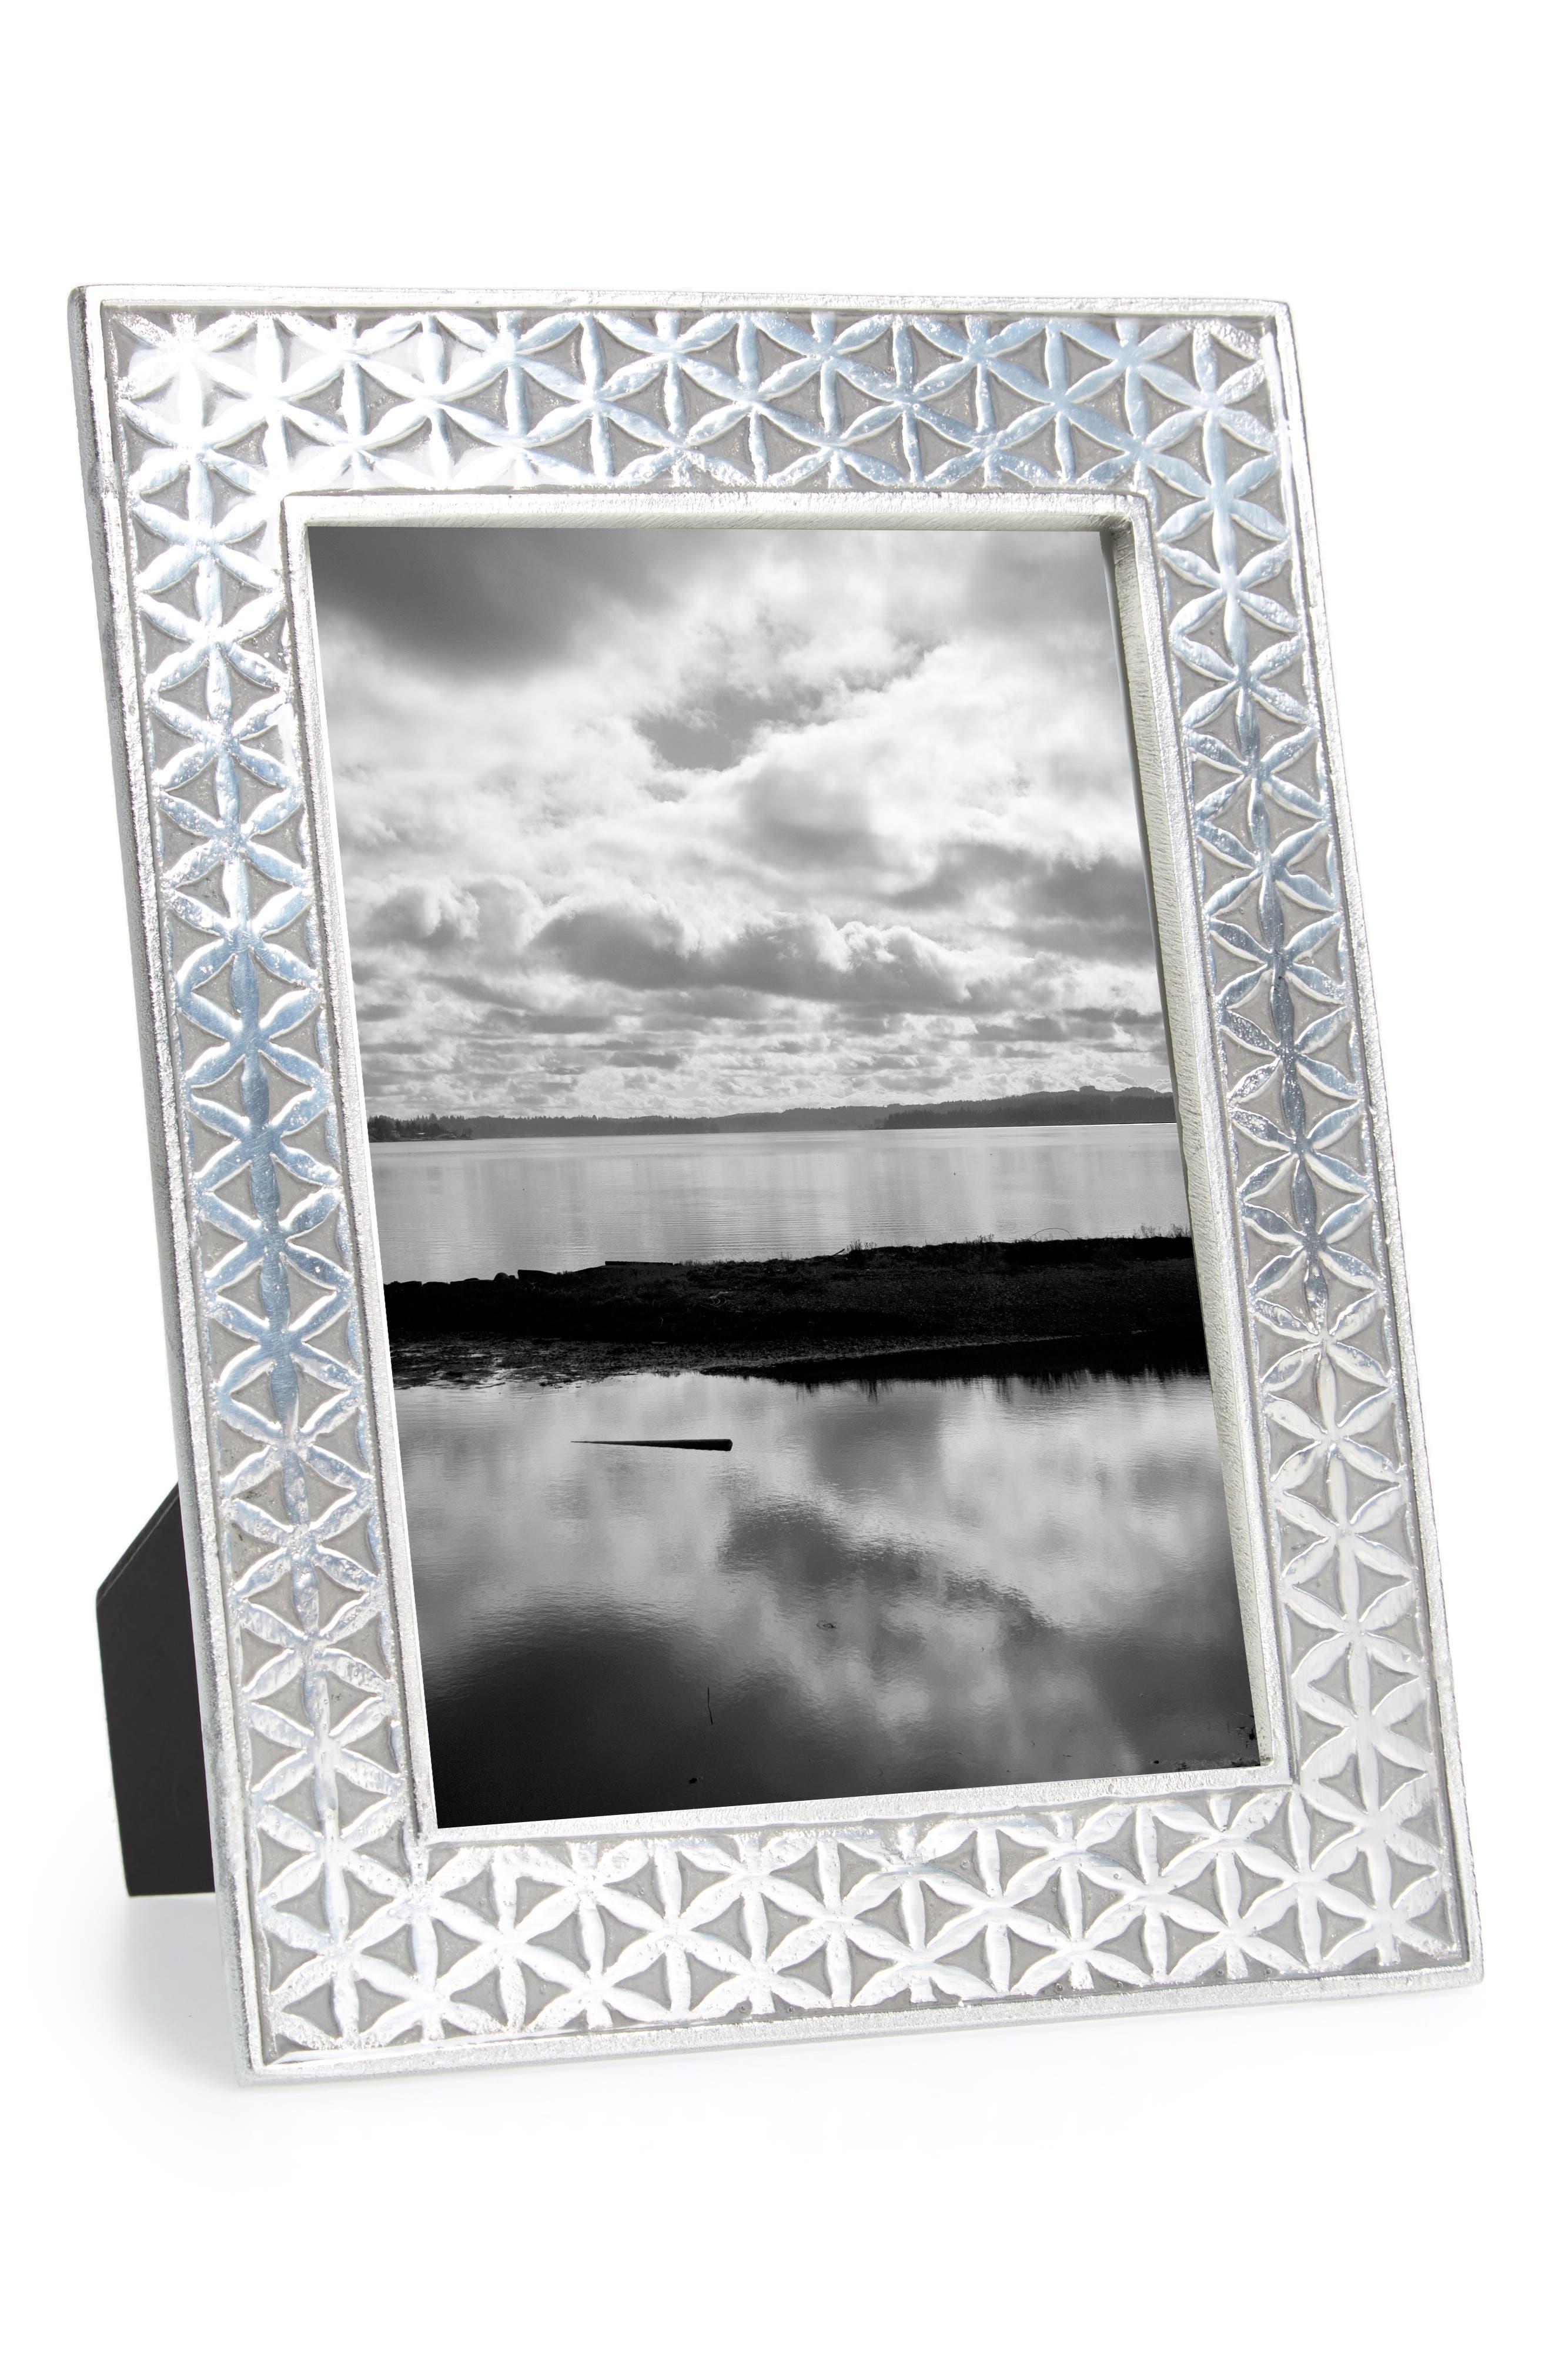 Main Image - Marigold Artisans Flower of Life Picture Frame